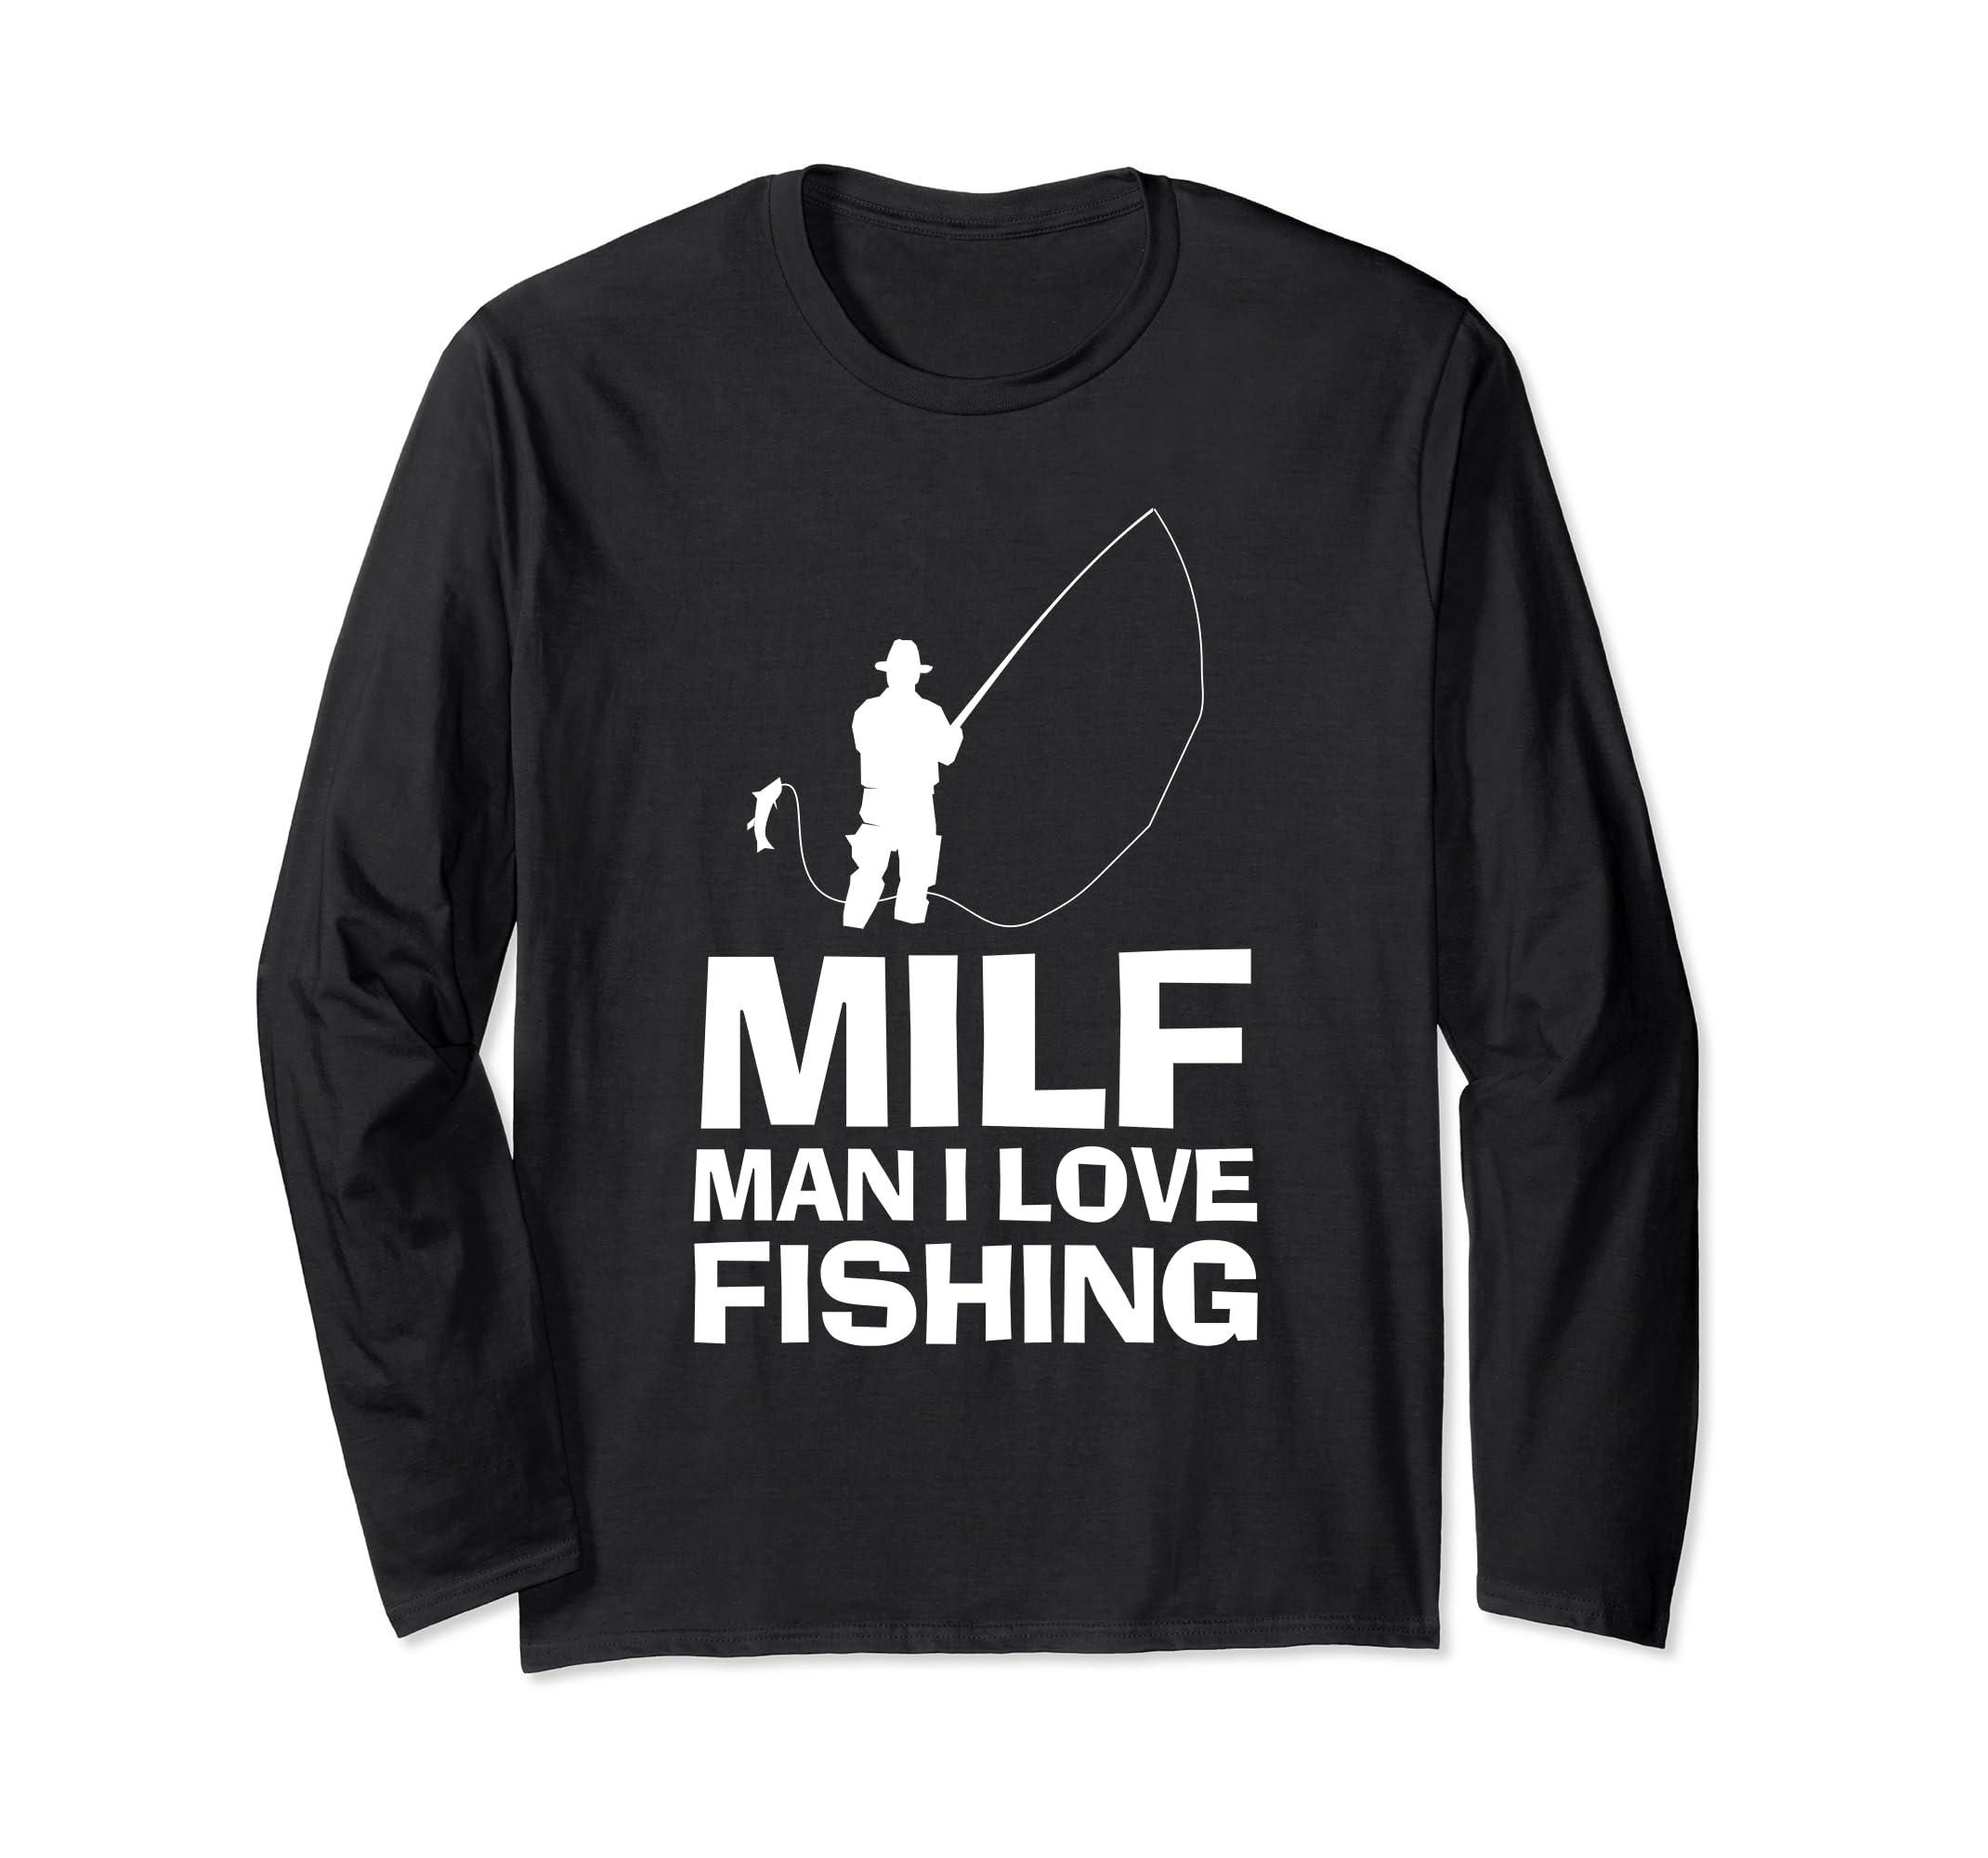 cc74d885 Amazon.com: Man I Love Fishing Long Sleeve: Clothing